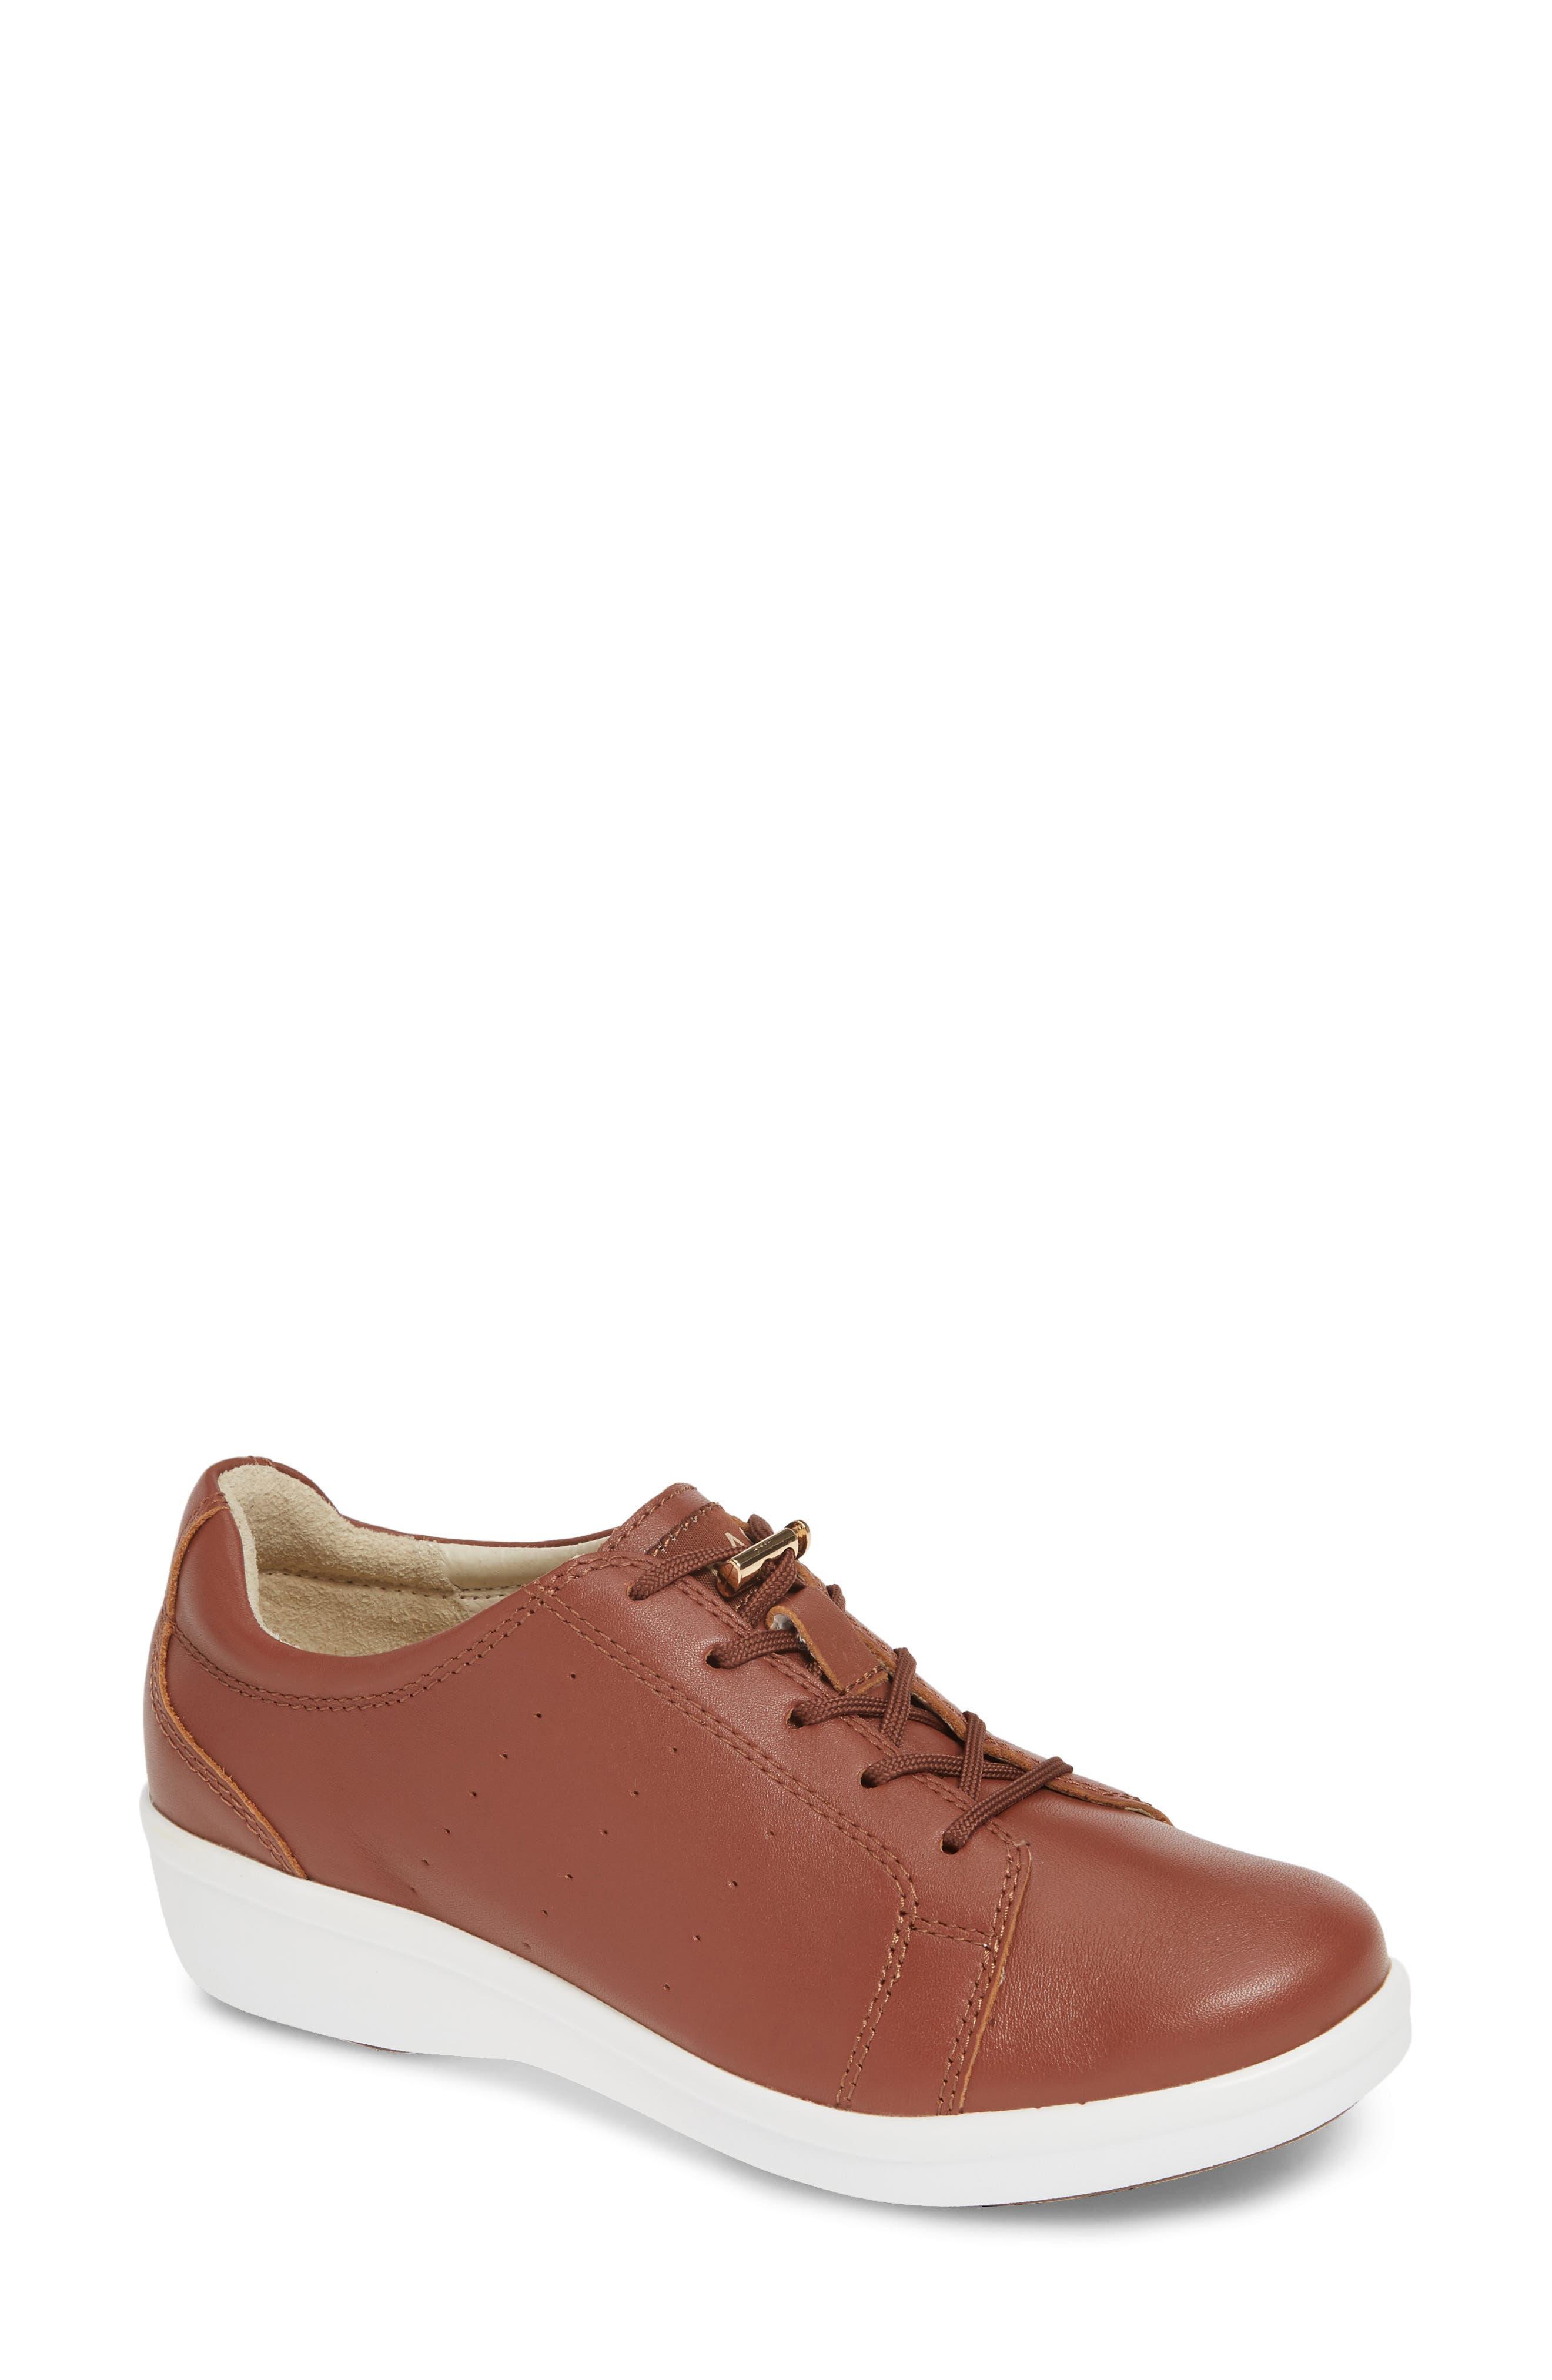 Alegria Cliq Sneaker, Brown